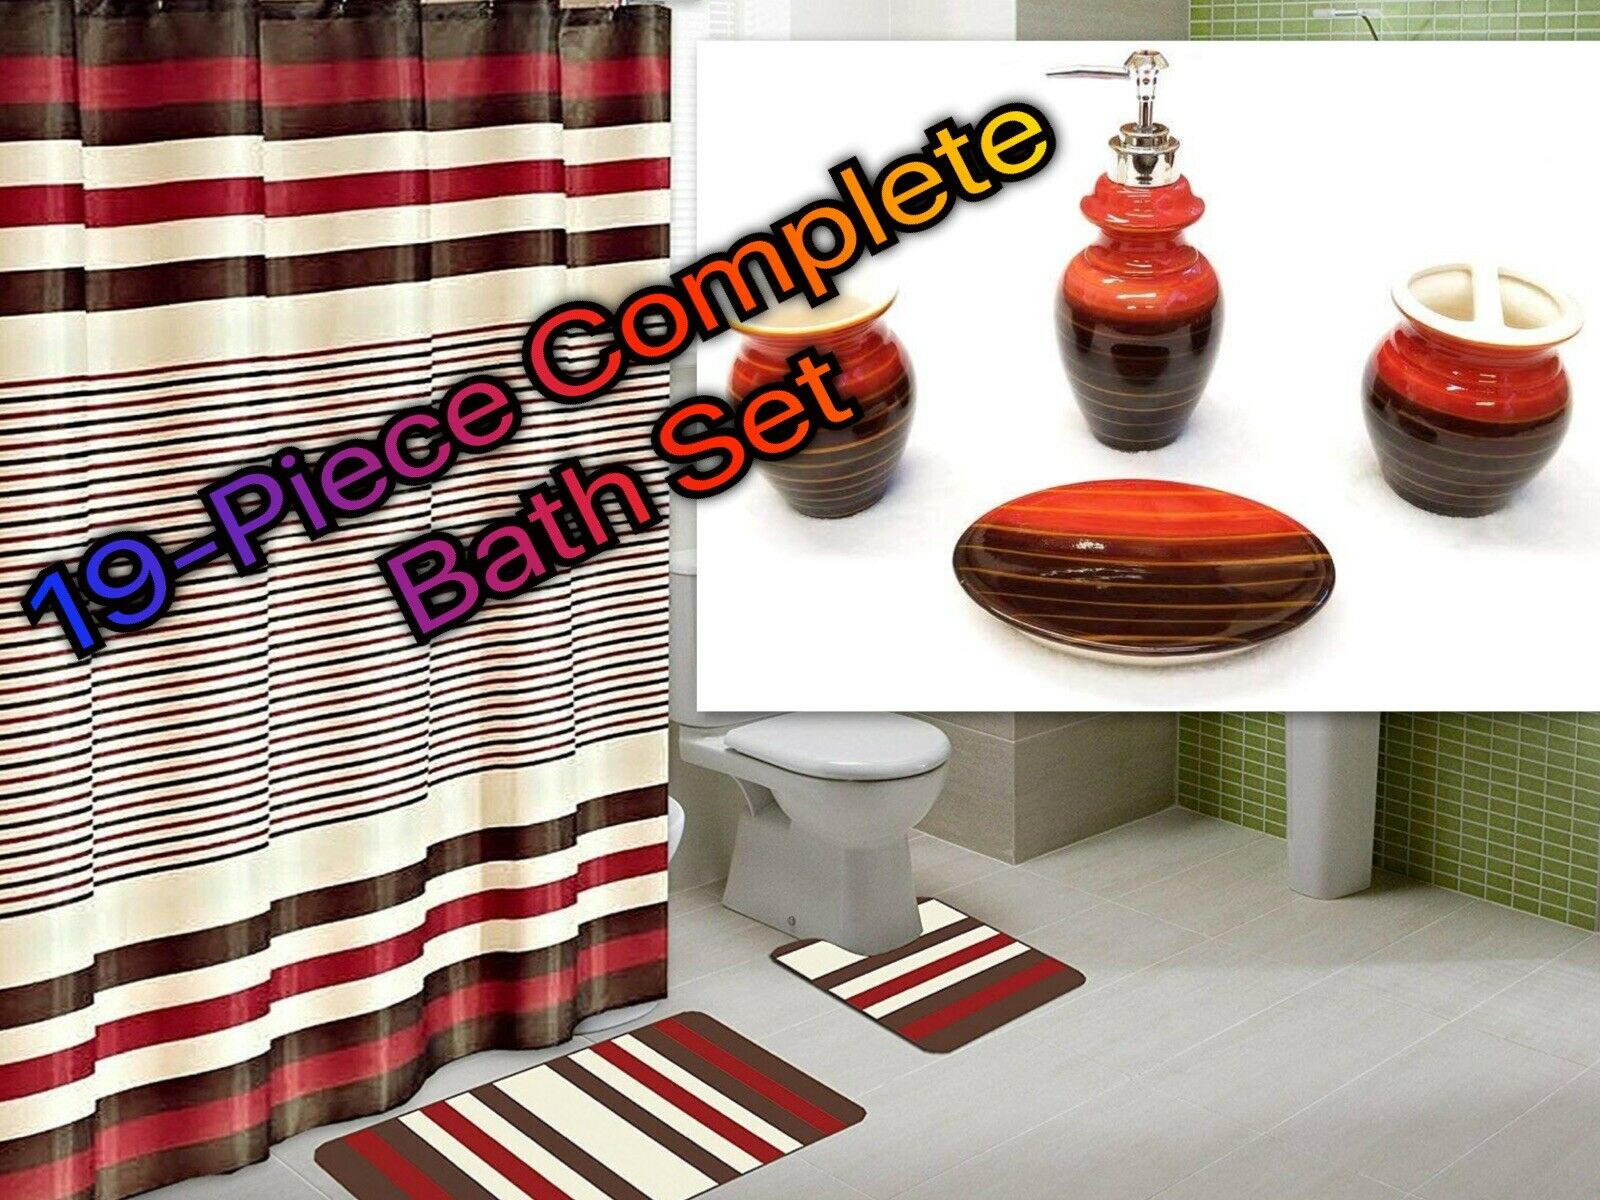 19 Piece Complete Bathroom Set Rugs Shower Curtain Hooks Ceramic All Included Walmart Com Walmart Com